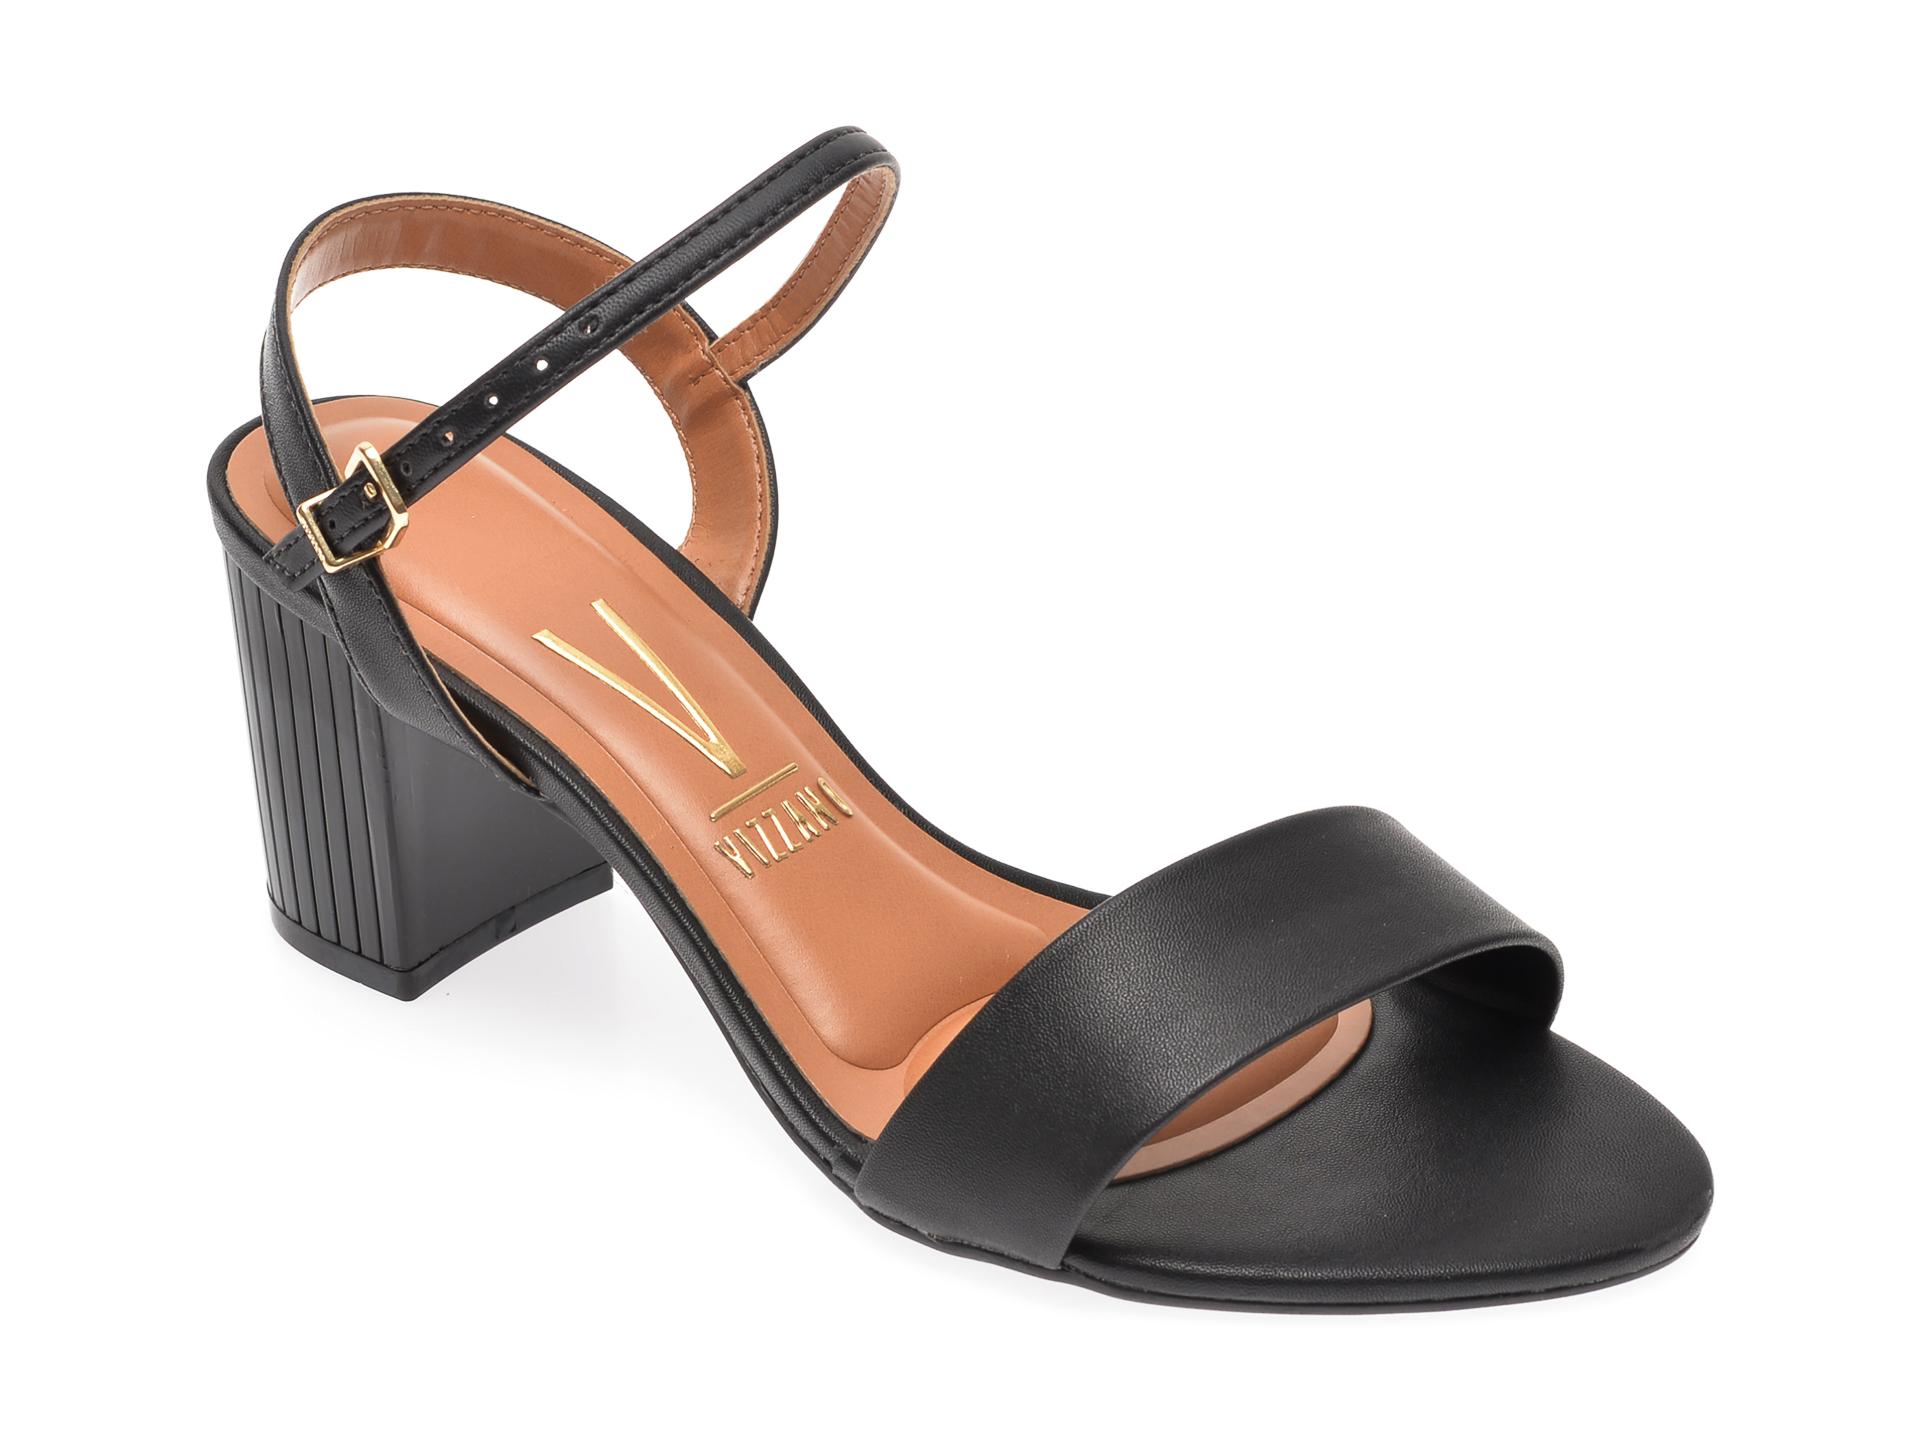 Sandale VIZZANO negre, 6375304, din piele ecologica